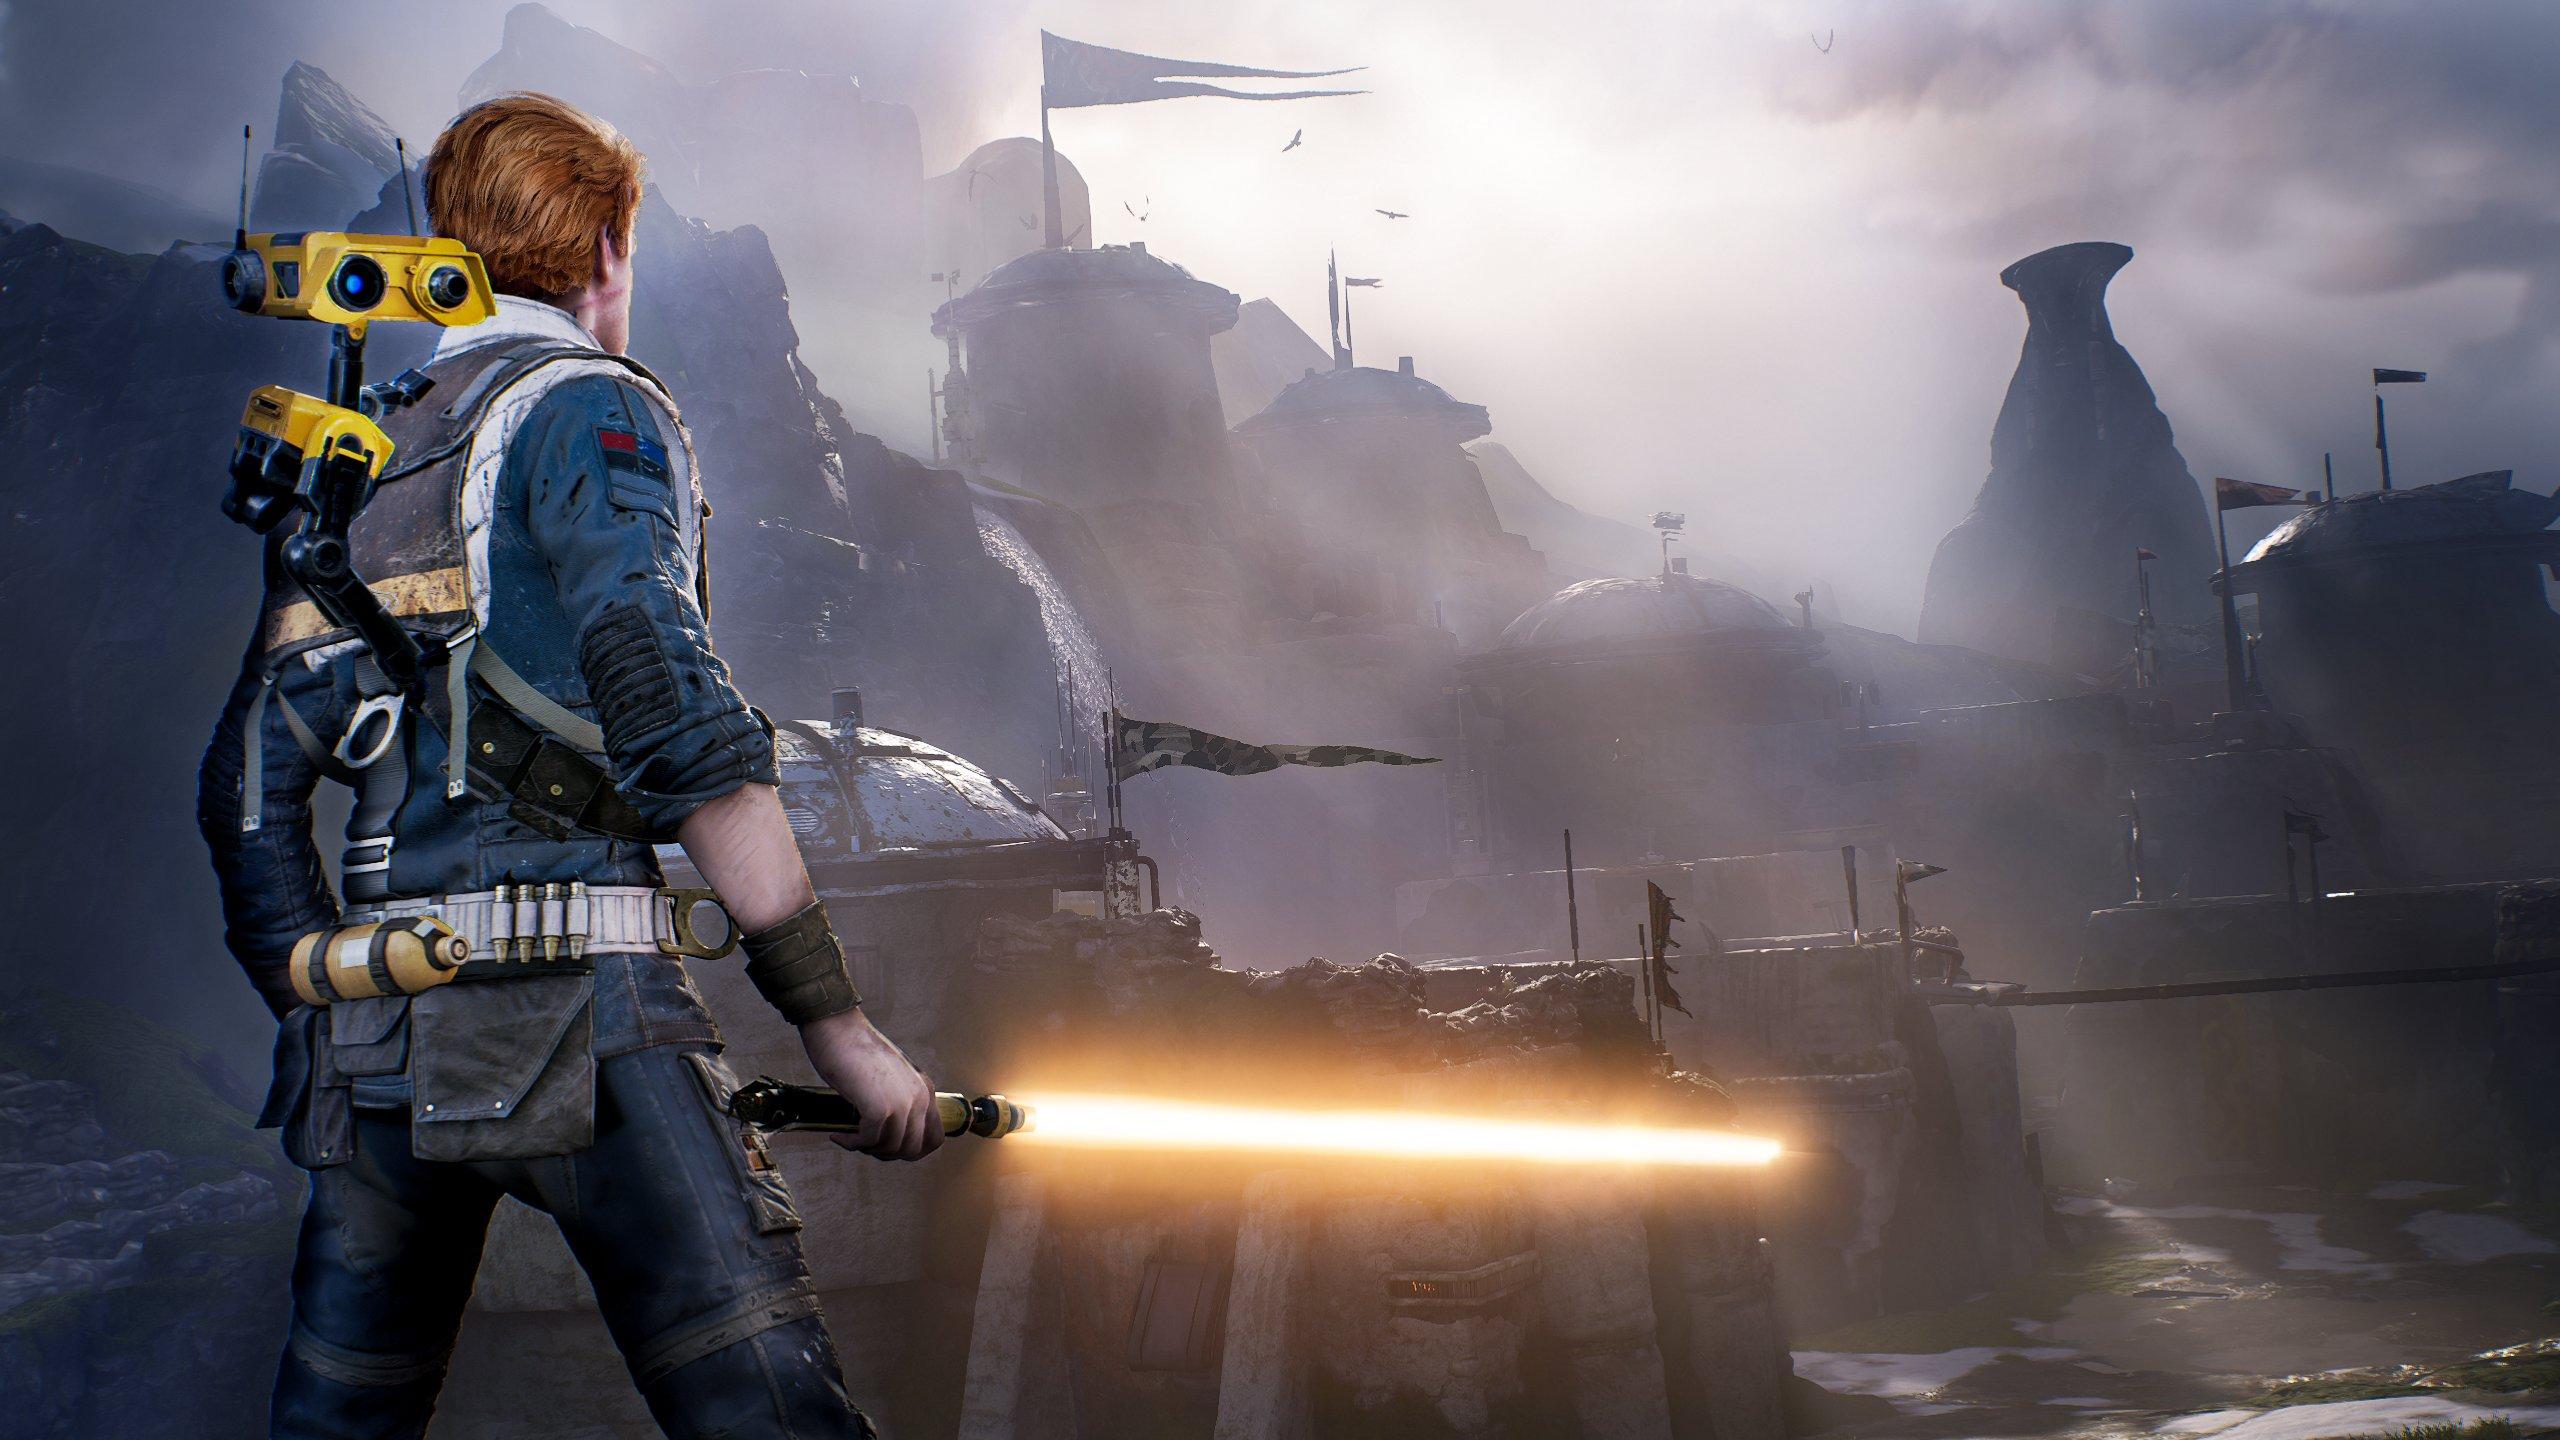 Star Wars Jedi: Fallen Order, fra i bonus preorder anche la spada laser  arancione | GameSoul.it